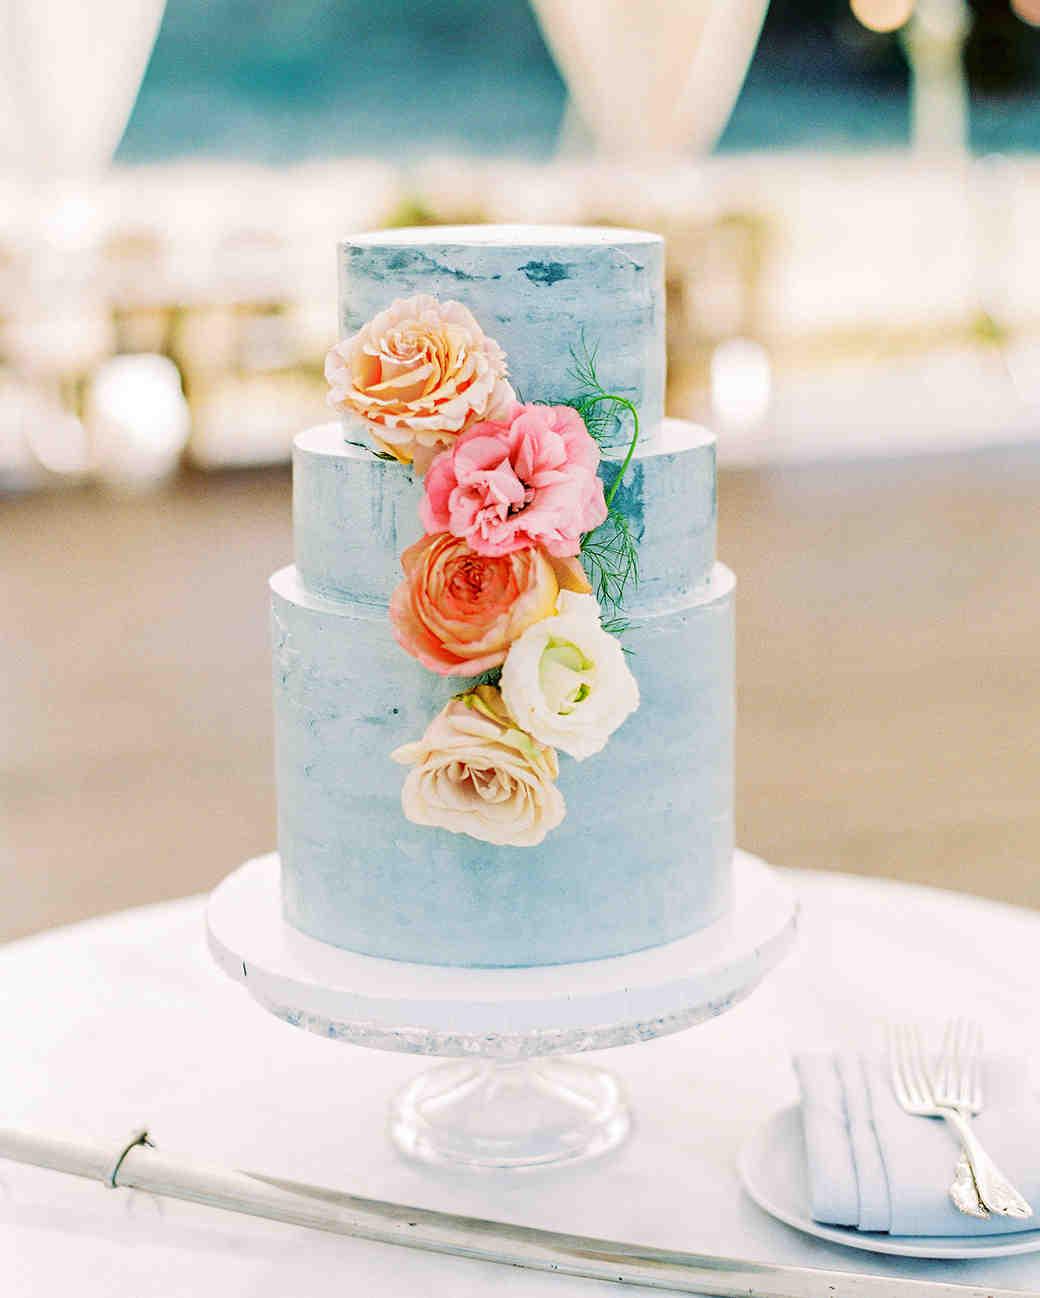 caitlin-amit-wedding-cake-365-6488867-0418_vert copy.jpg